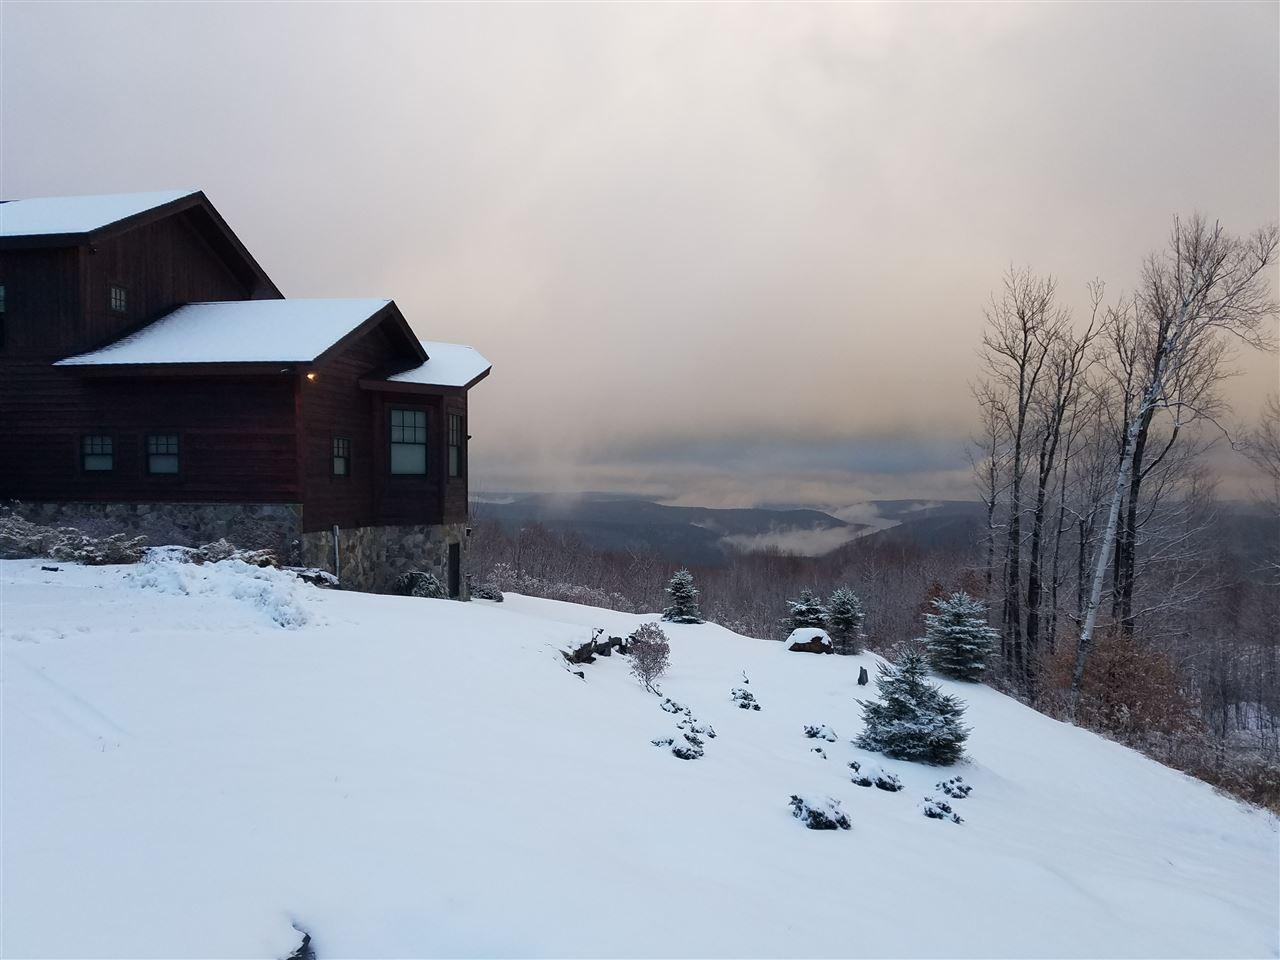 Mount-Snow-Real-Estate-4611174-3